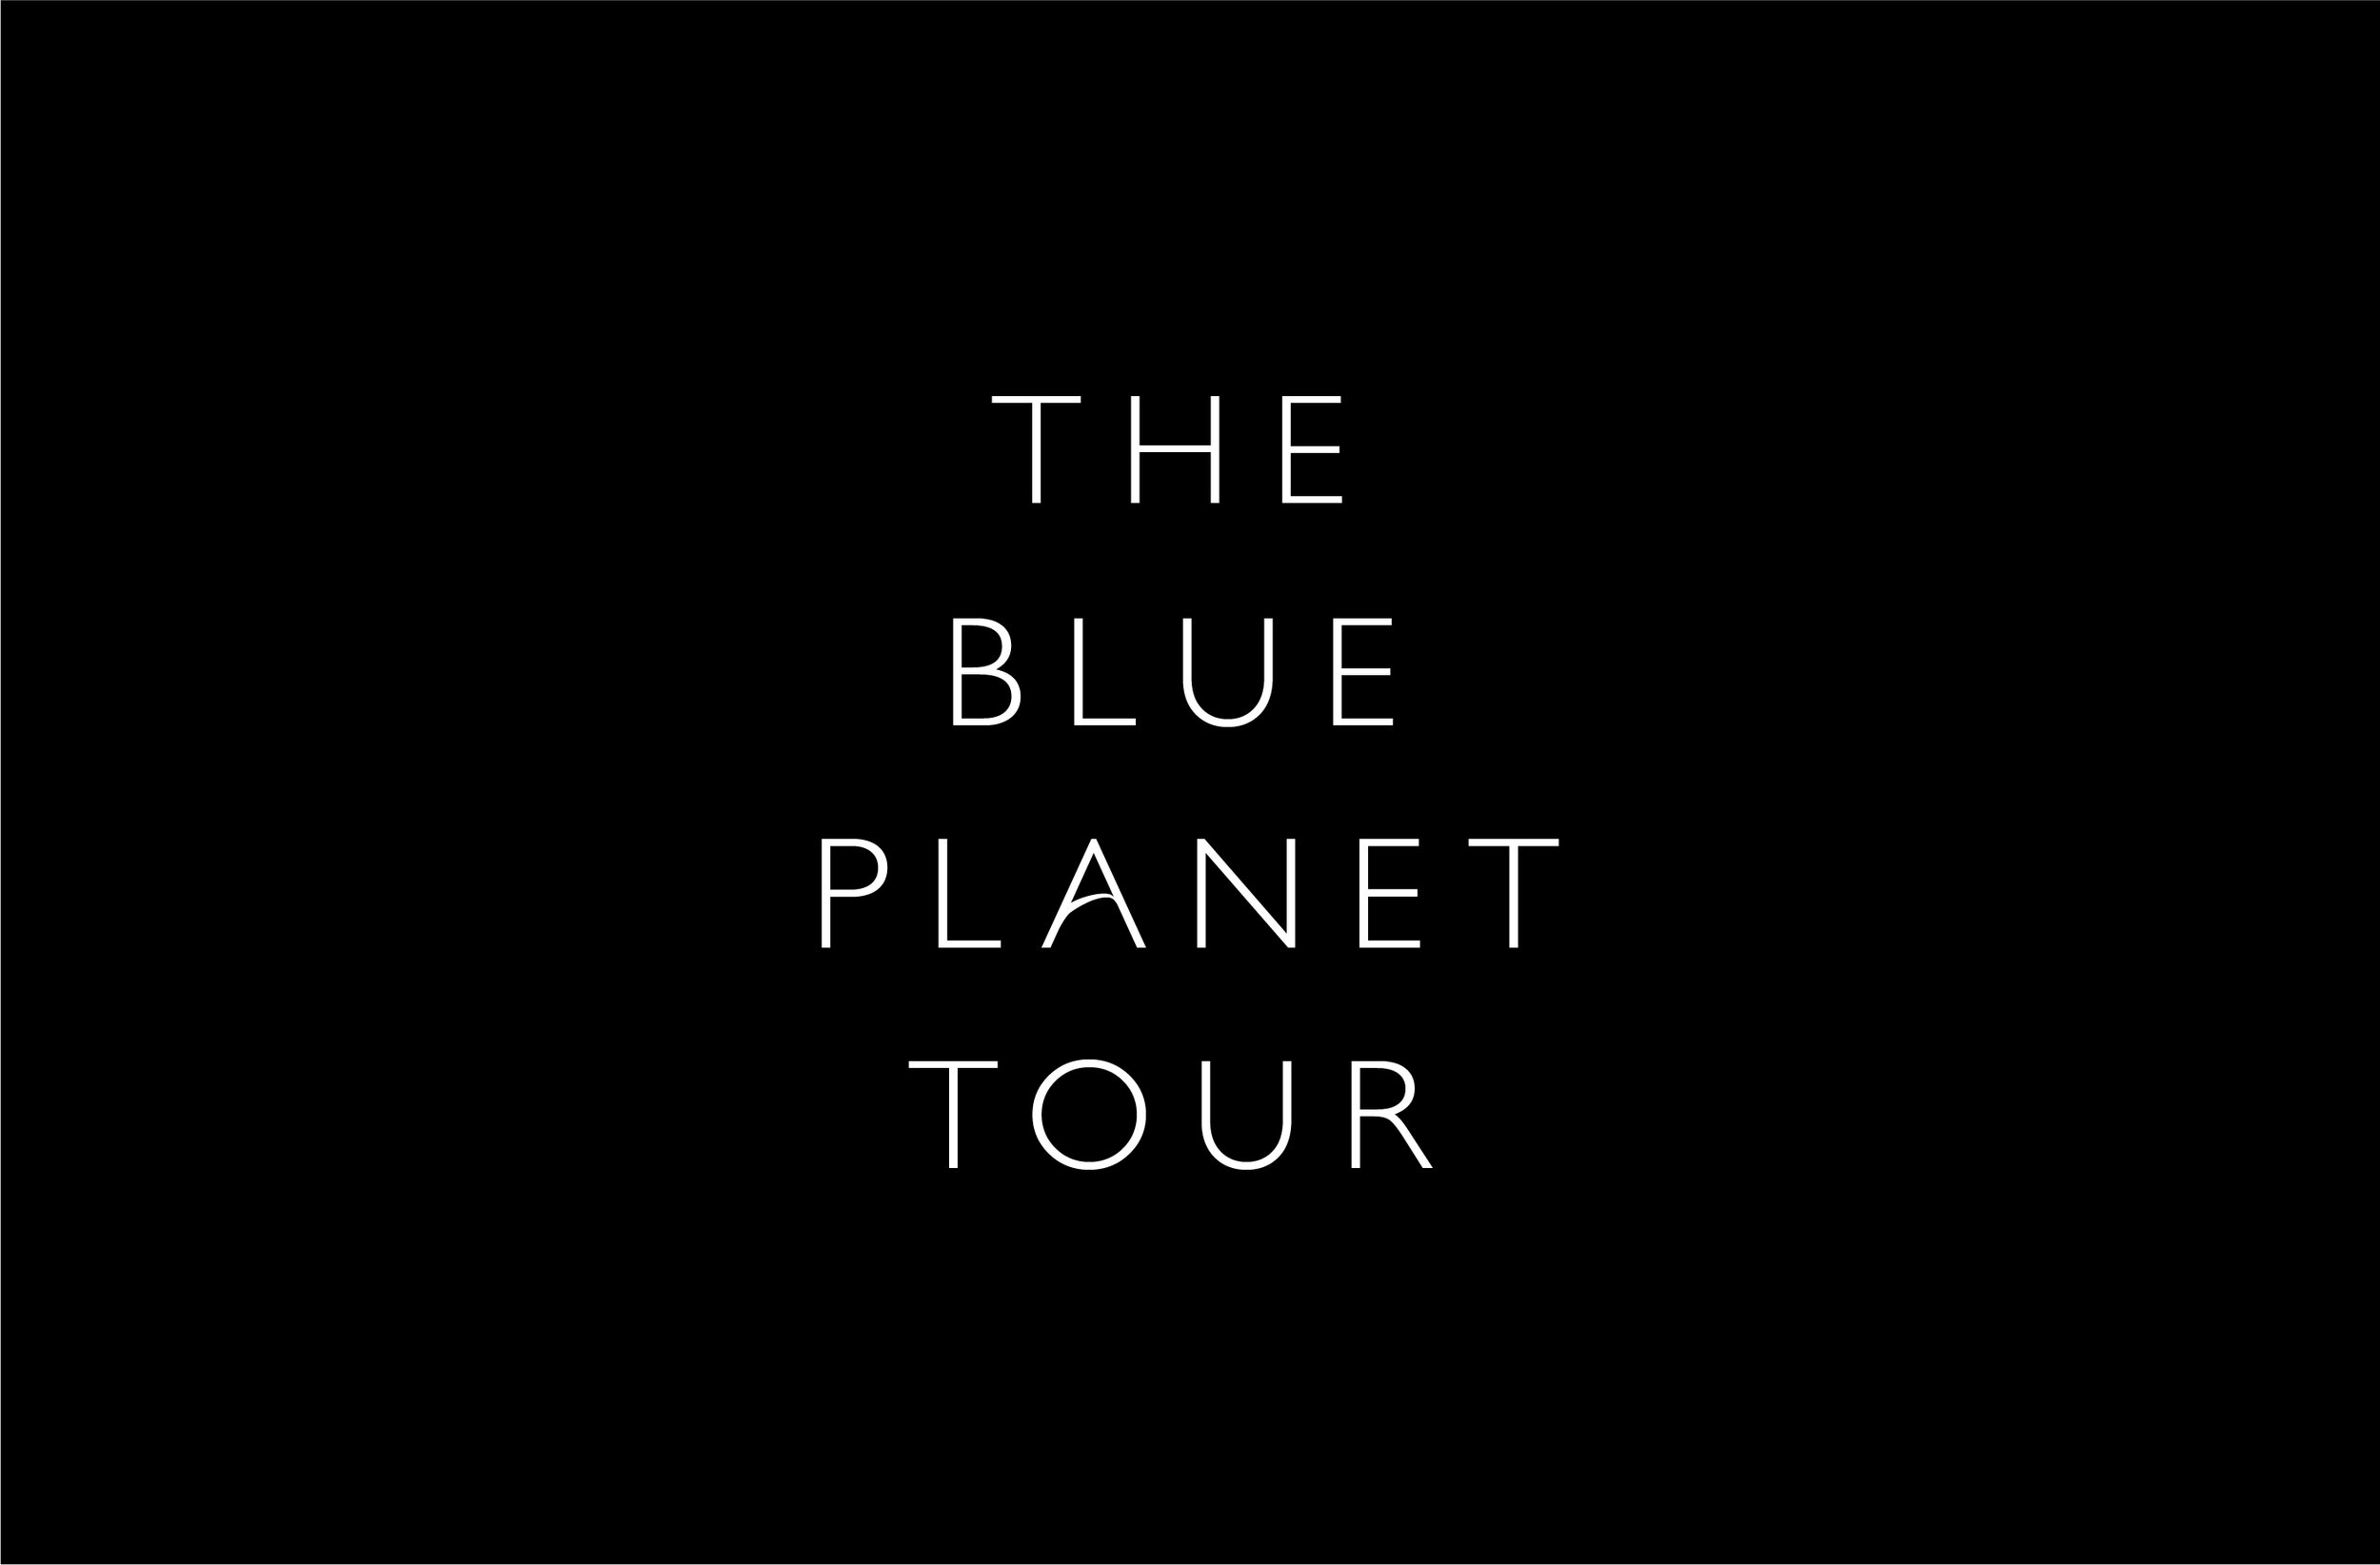 Blue planet logo.jpg